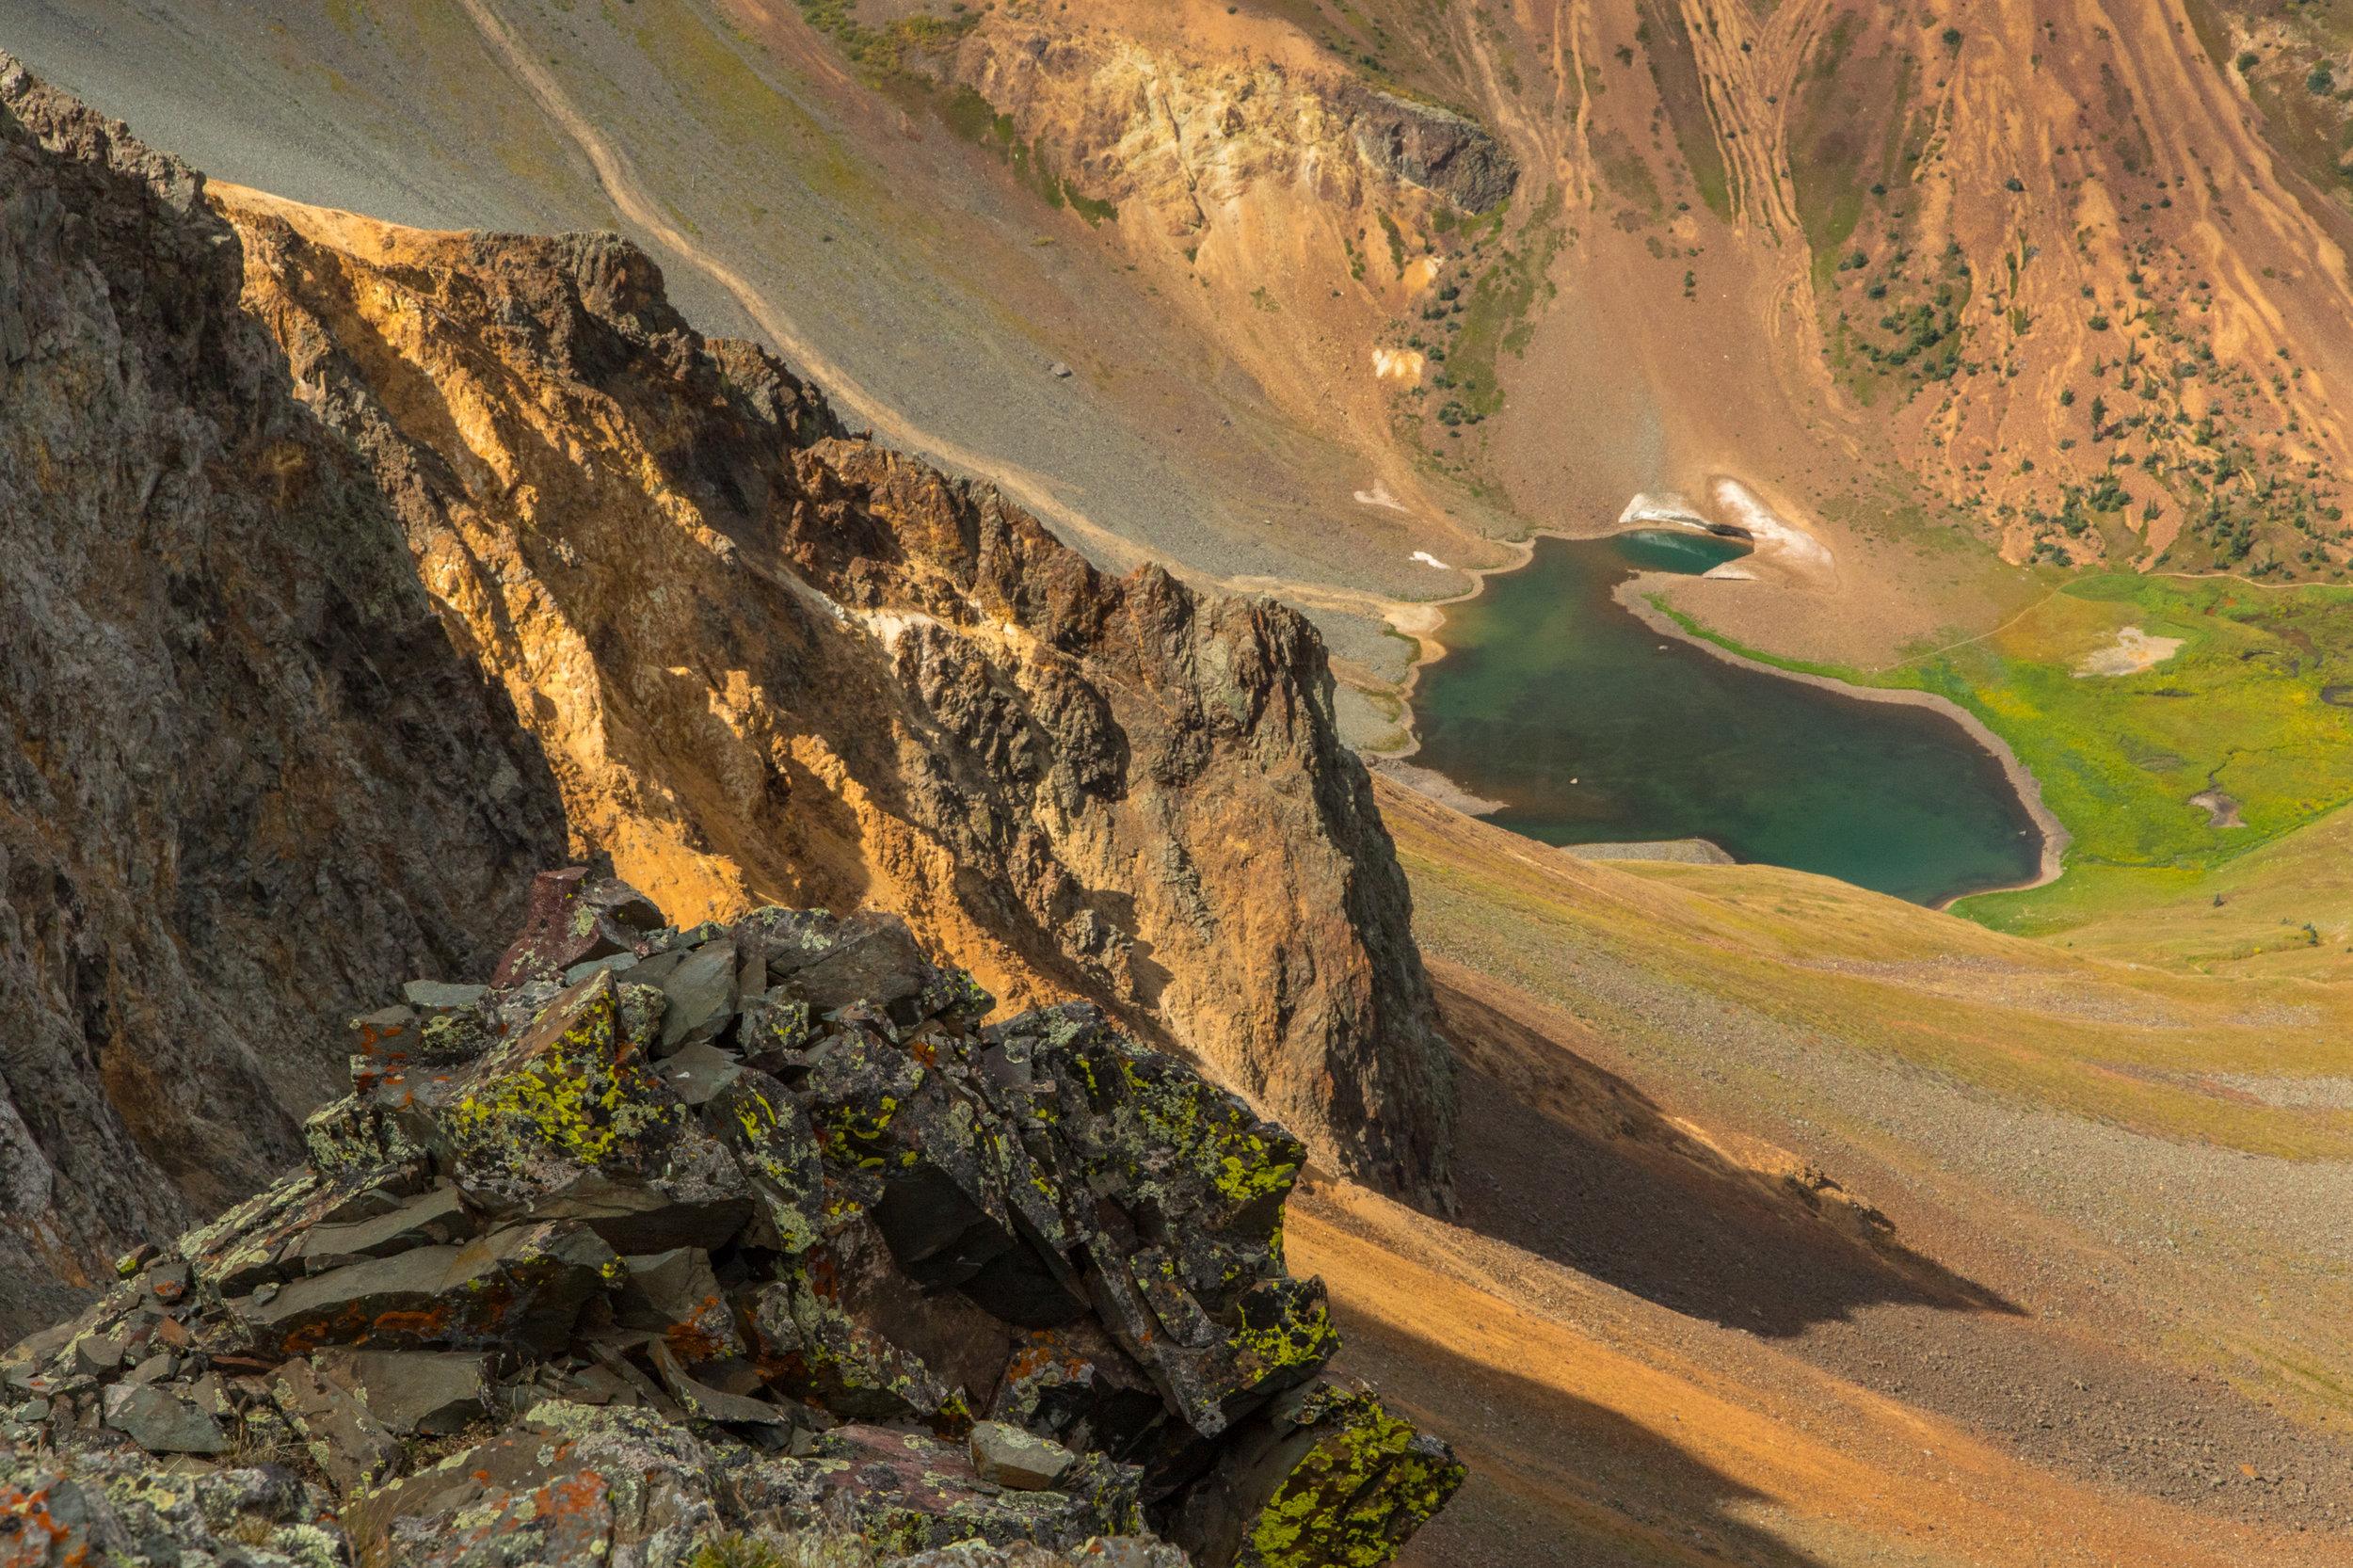 Velocity Lake, Image # 7795